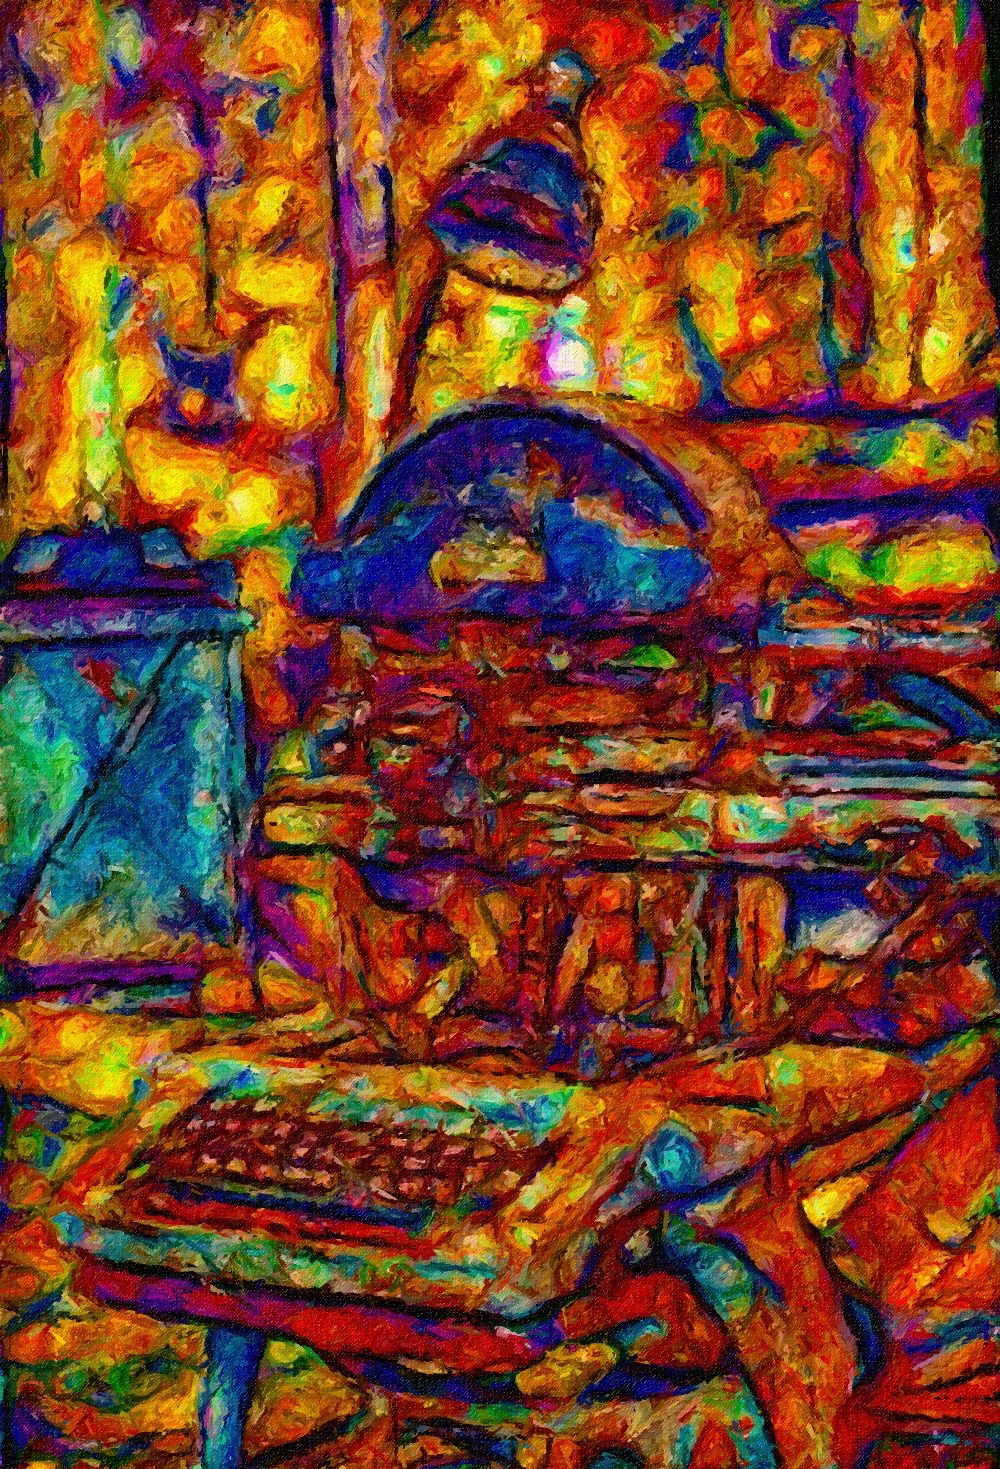 ArtRage 4, Photomanipulation with Redfield, & Alien Skin Filters, 11.2013